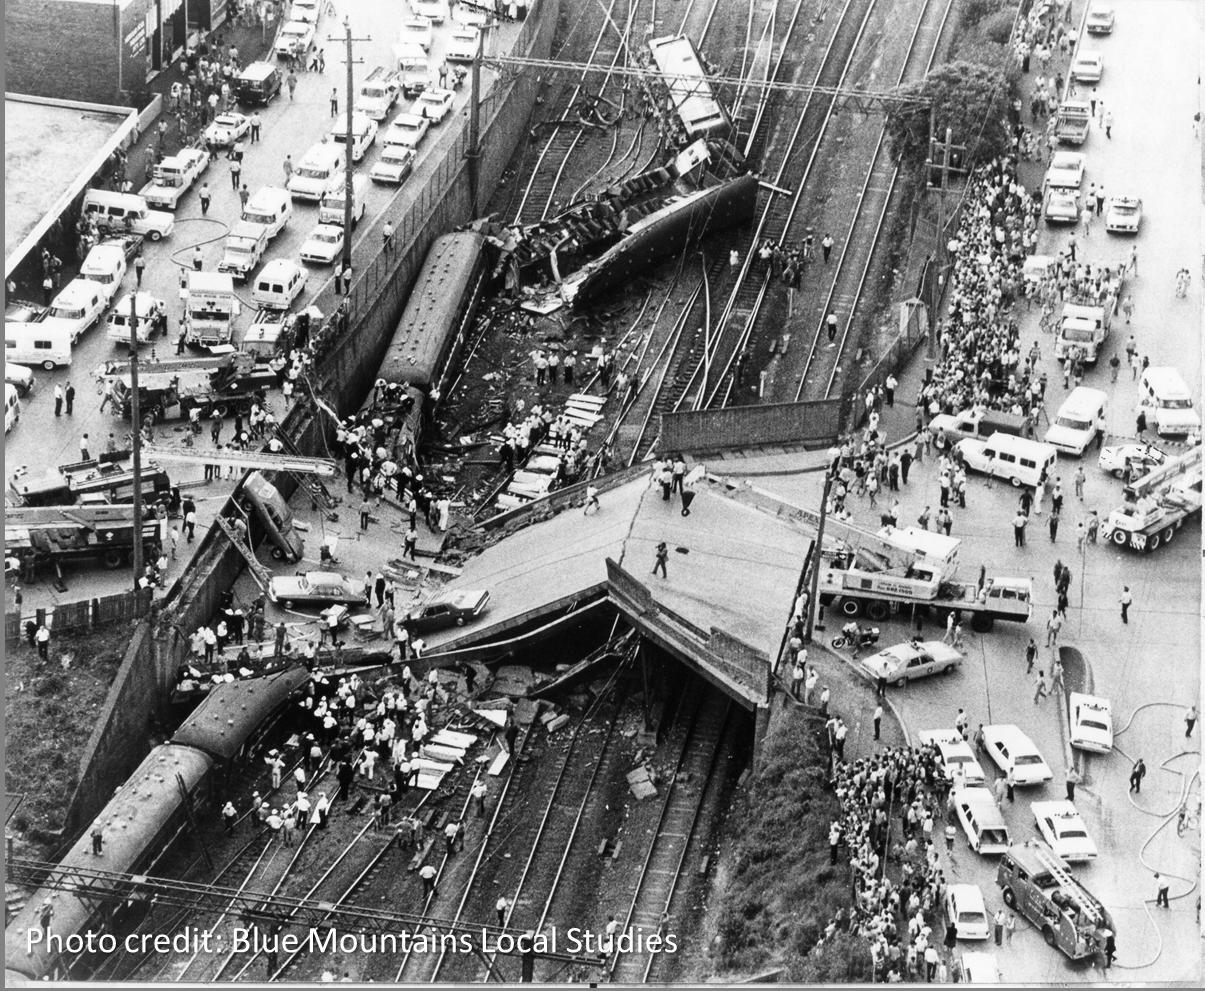 Photo of Granville Rail Disaster, Australia, January 1977